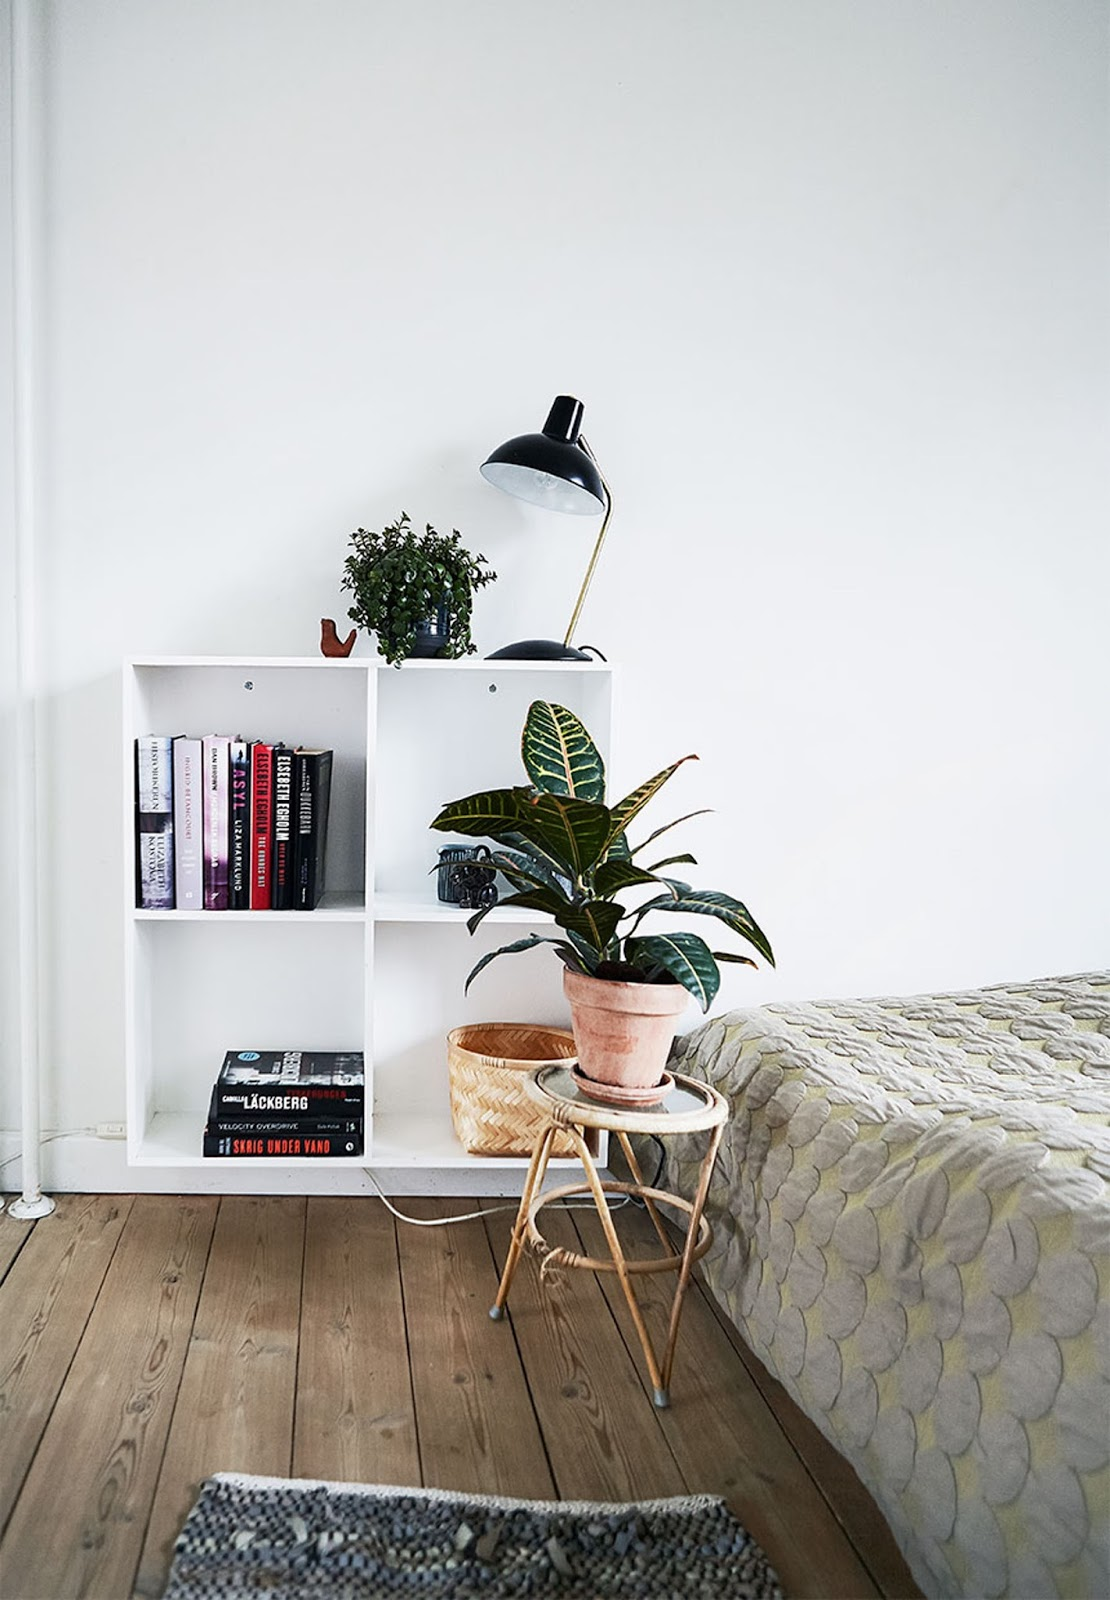 scandinavian interior, bookshelf, houseplants, interior design,